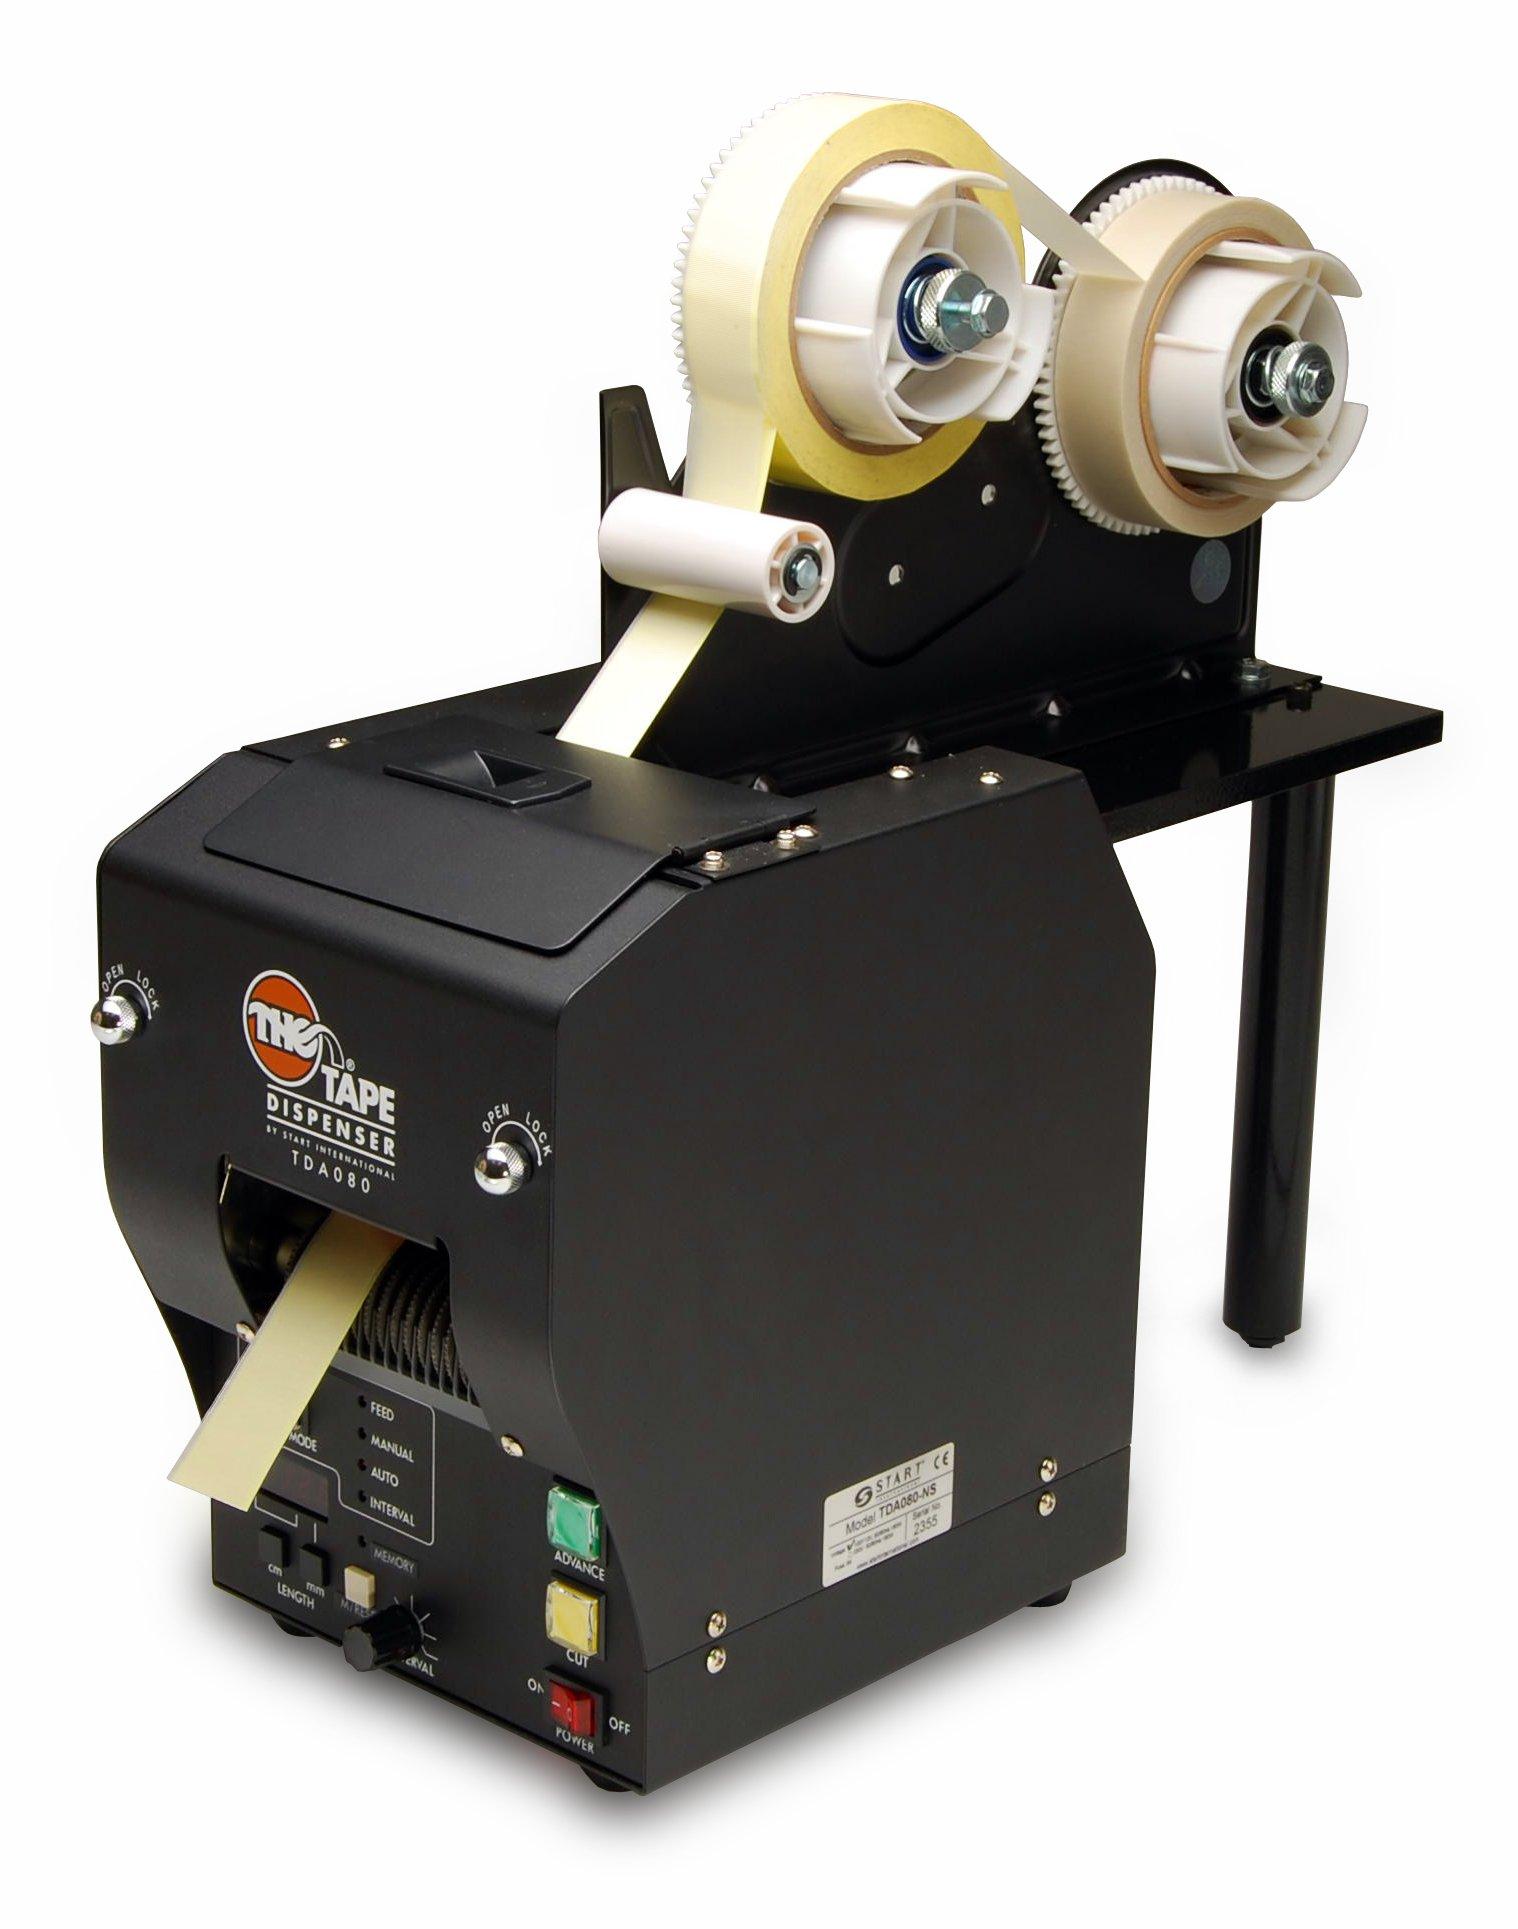 START International TDA080-LAM Electronic Heavy Duty Tape Dispenser with Laminator Feature